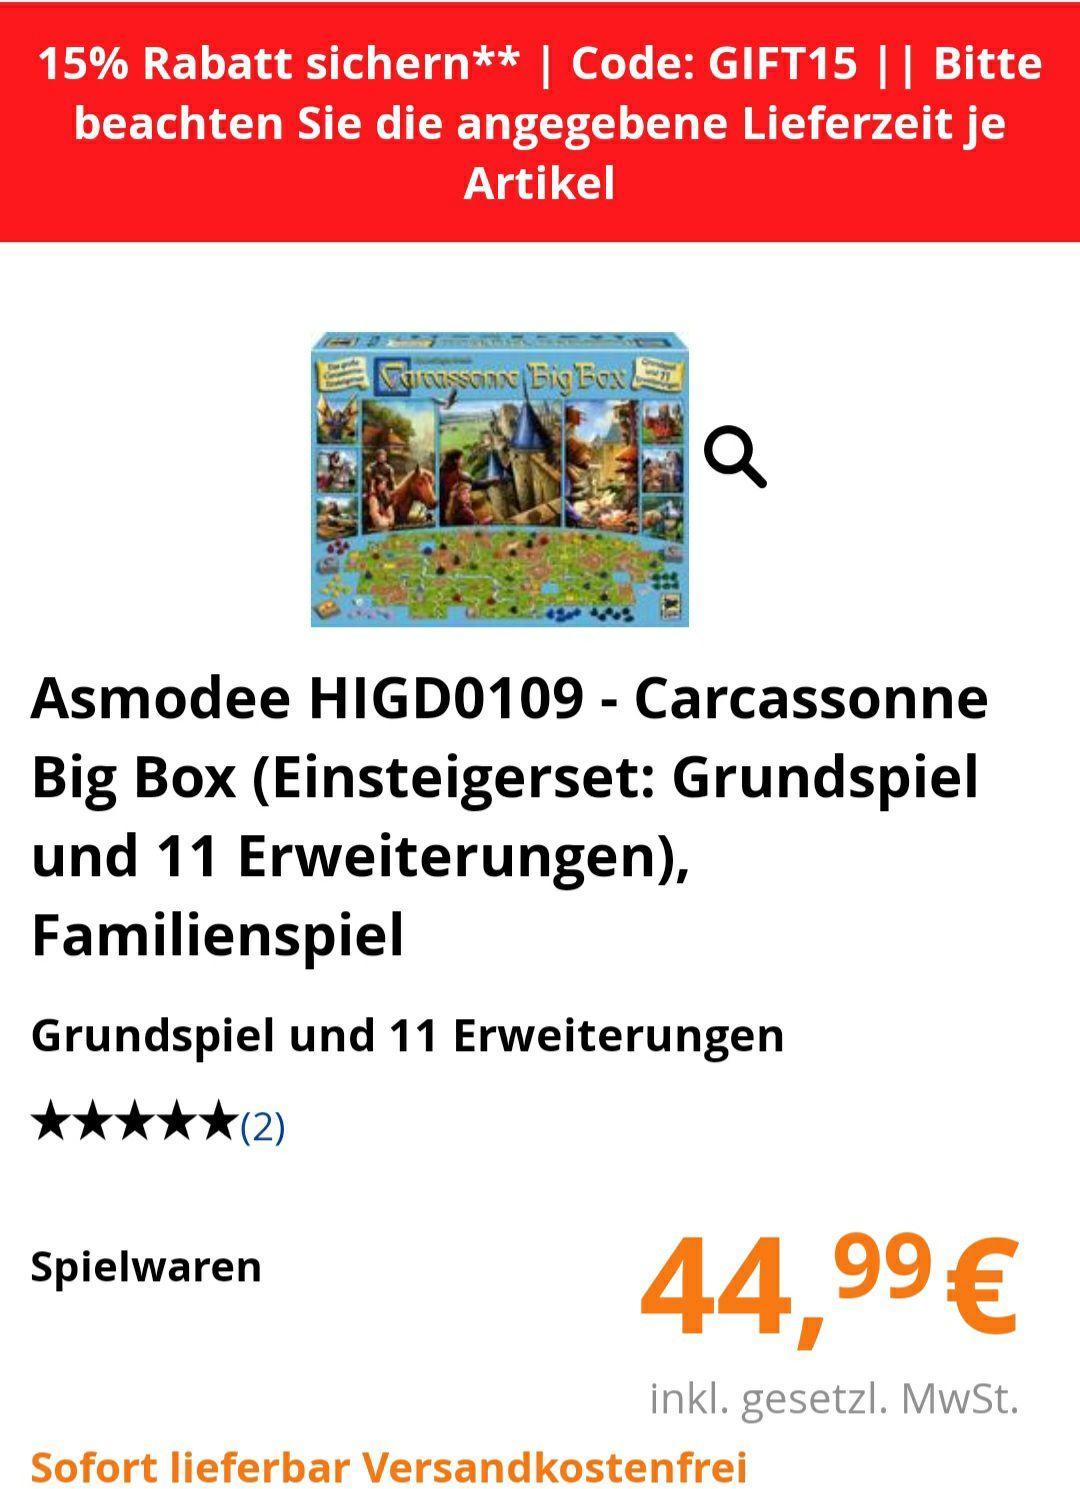 Carcassonne Big Box (bol.de) für 38,25 € inkl. Versand